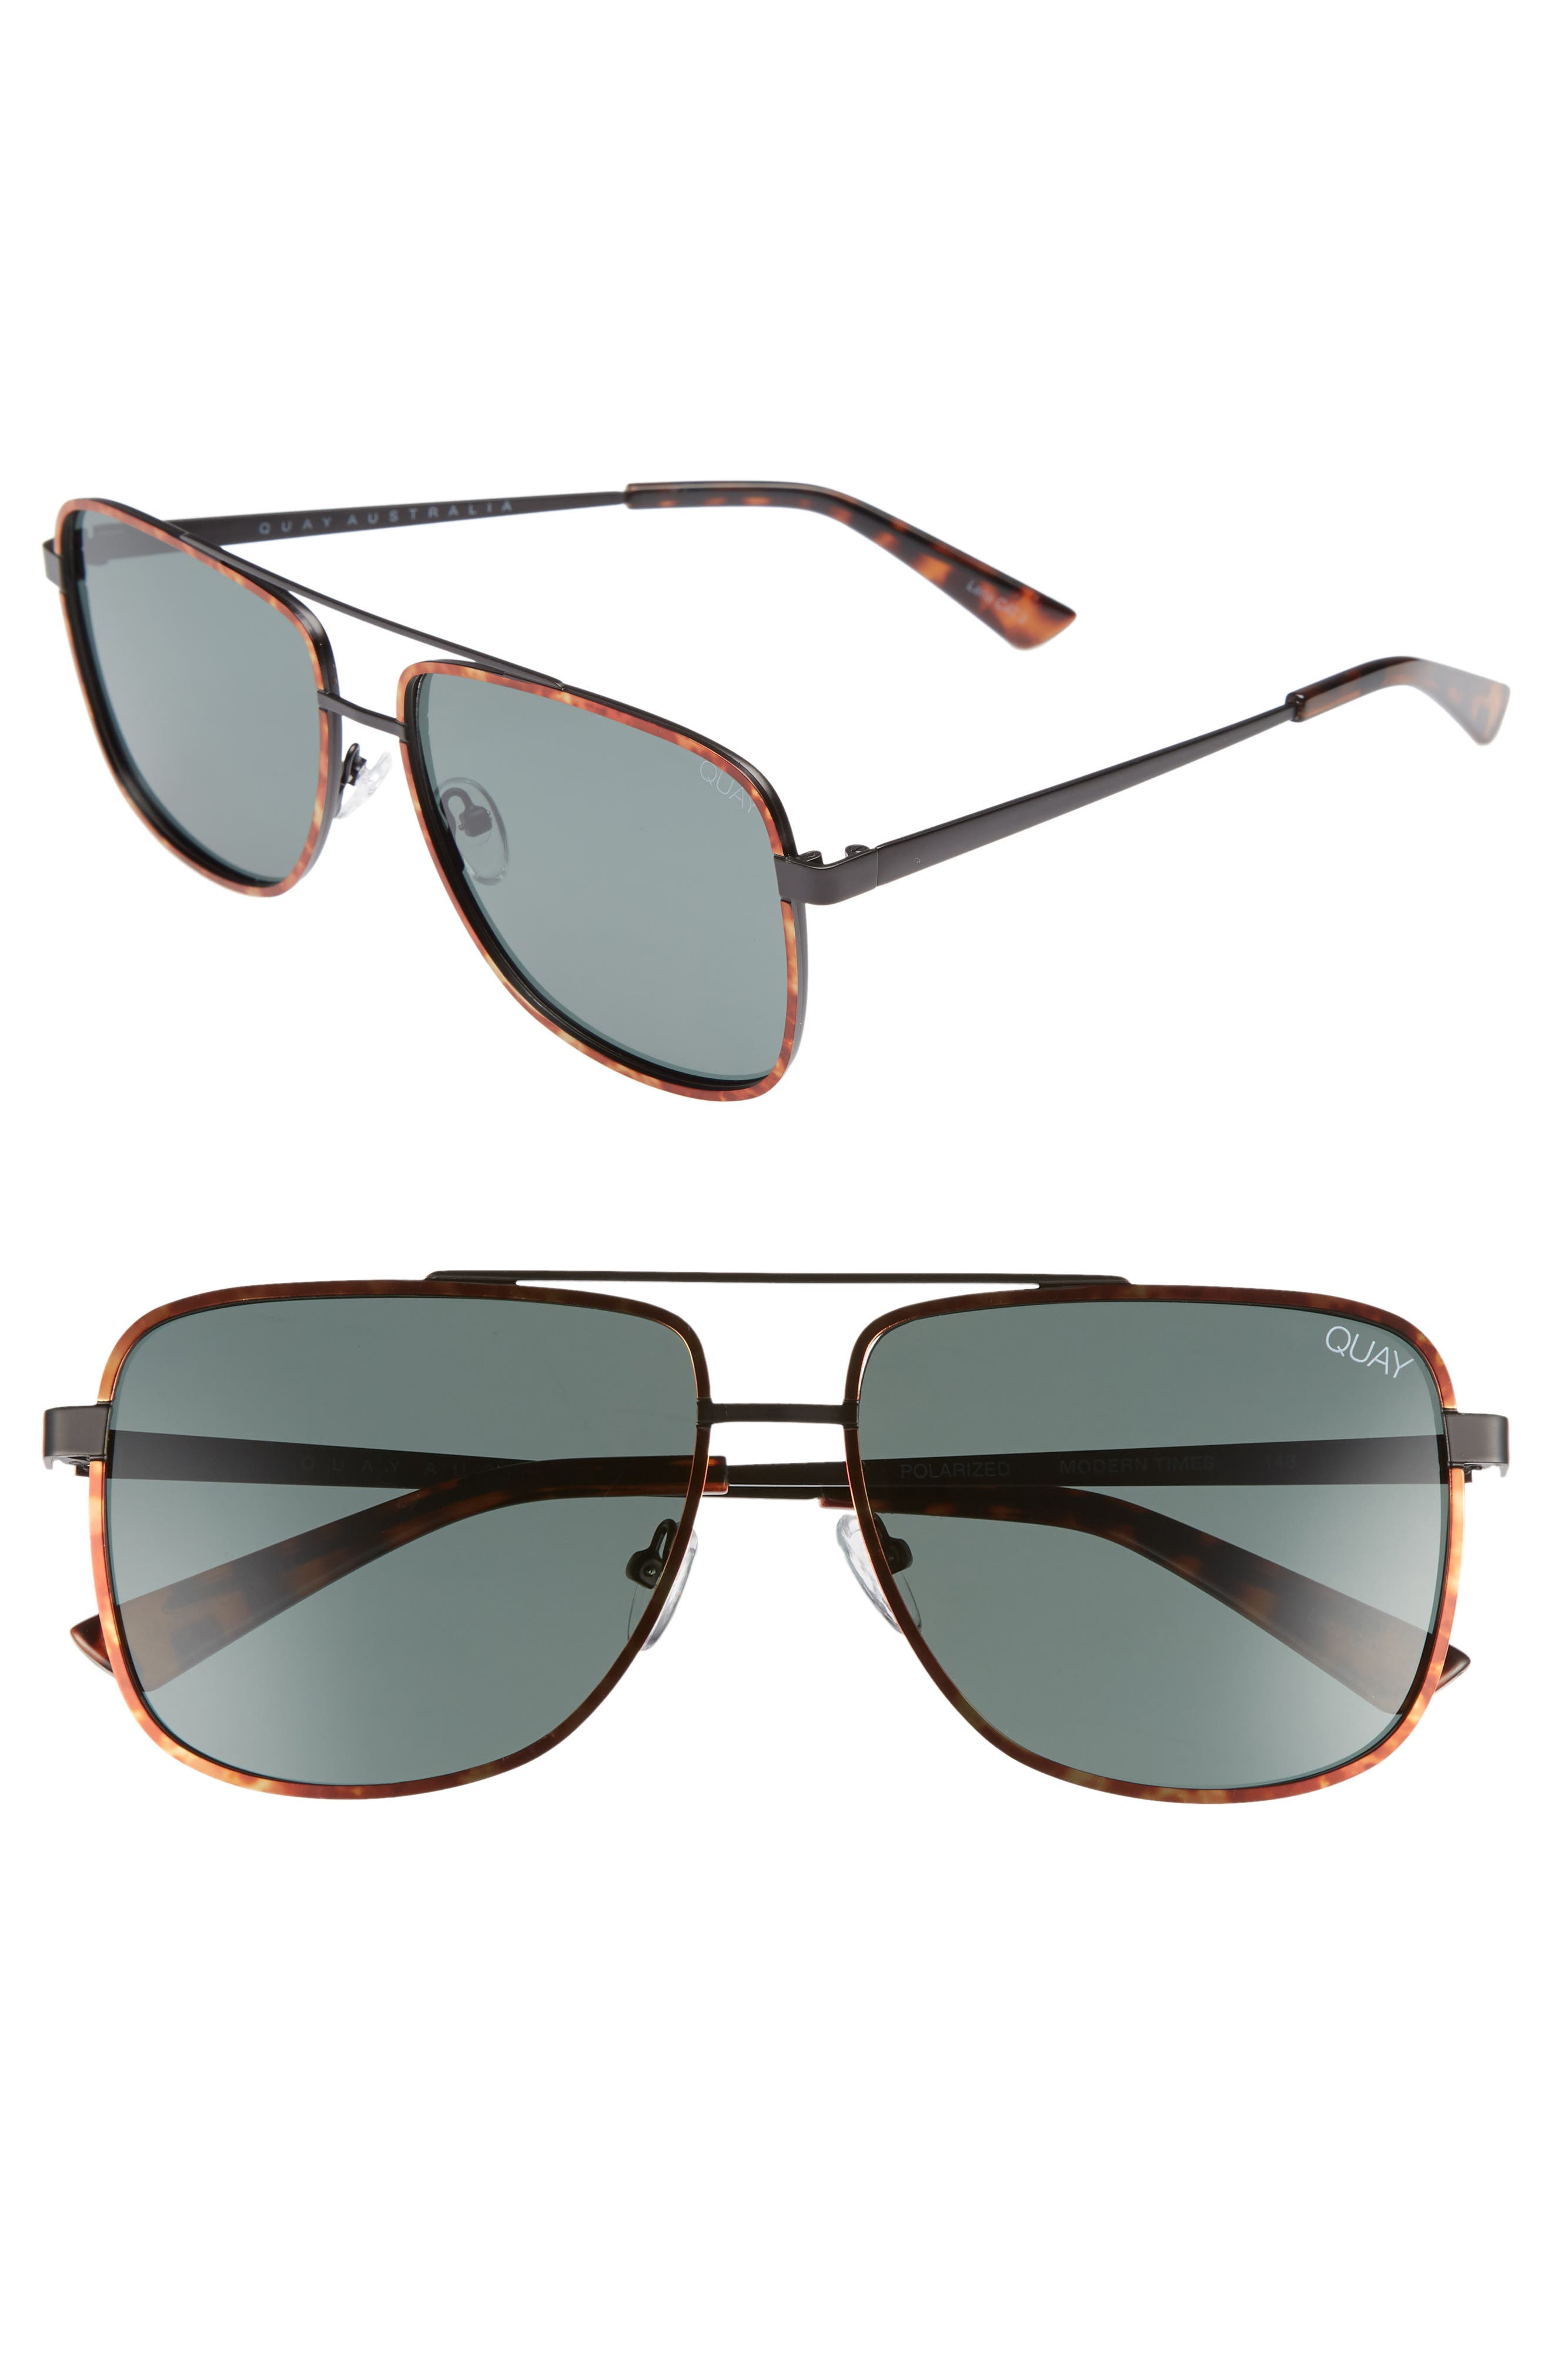 Modern Times 57mm Polarized Aviator Sunglasses,                             Main thumbnail 1, color,                             Tort / Green Lens